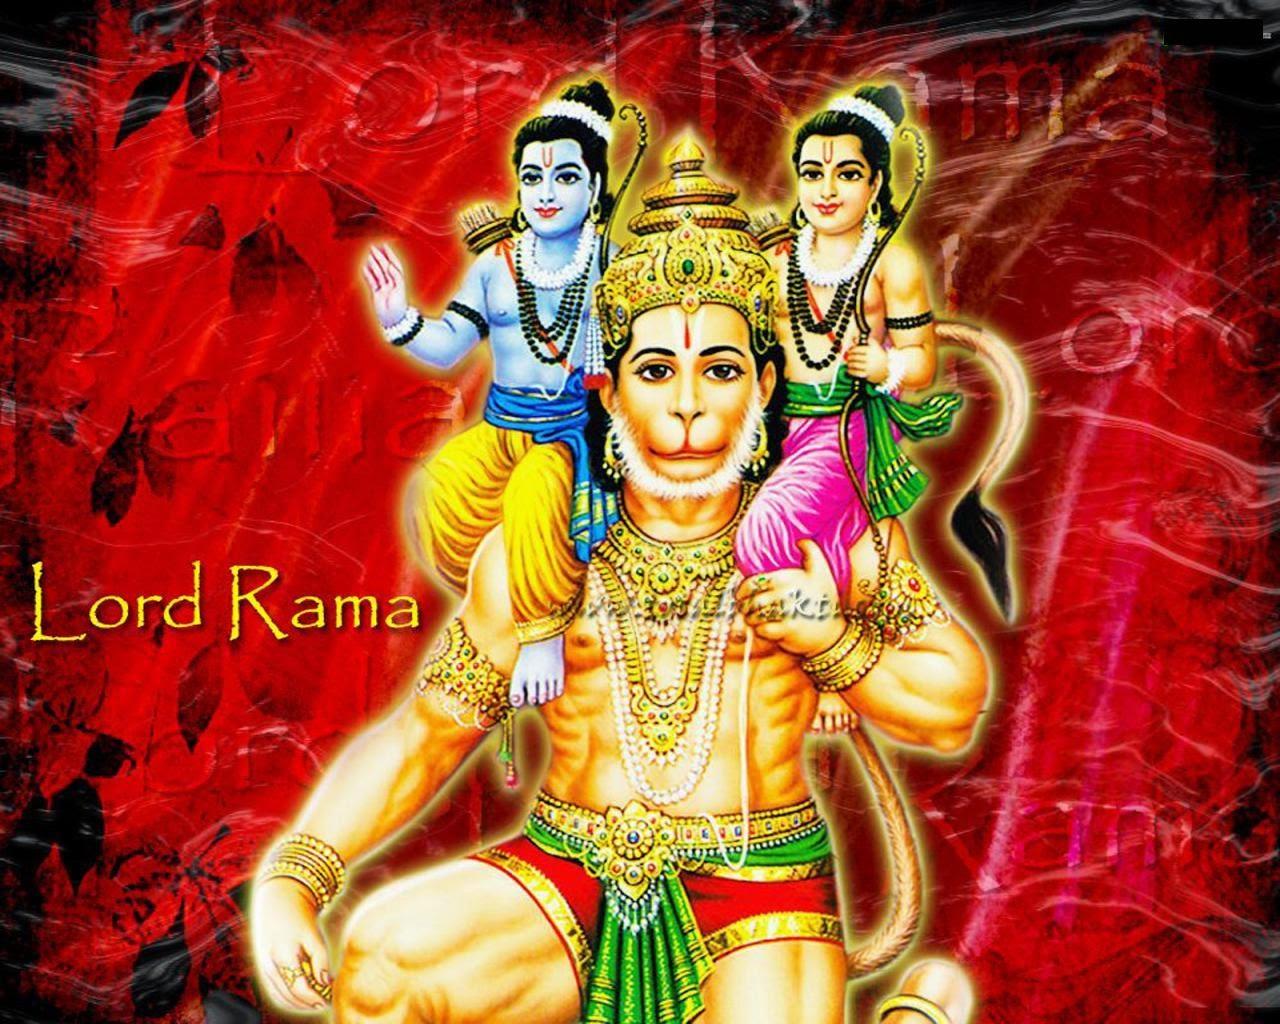 Shree Hanuman Ji Hindu God Ram Full Hd Wallpapers Free 1280x1024 Download Hd Wallpaper Wallpapertip